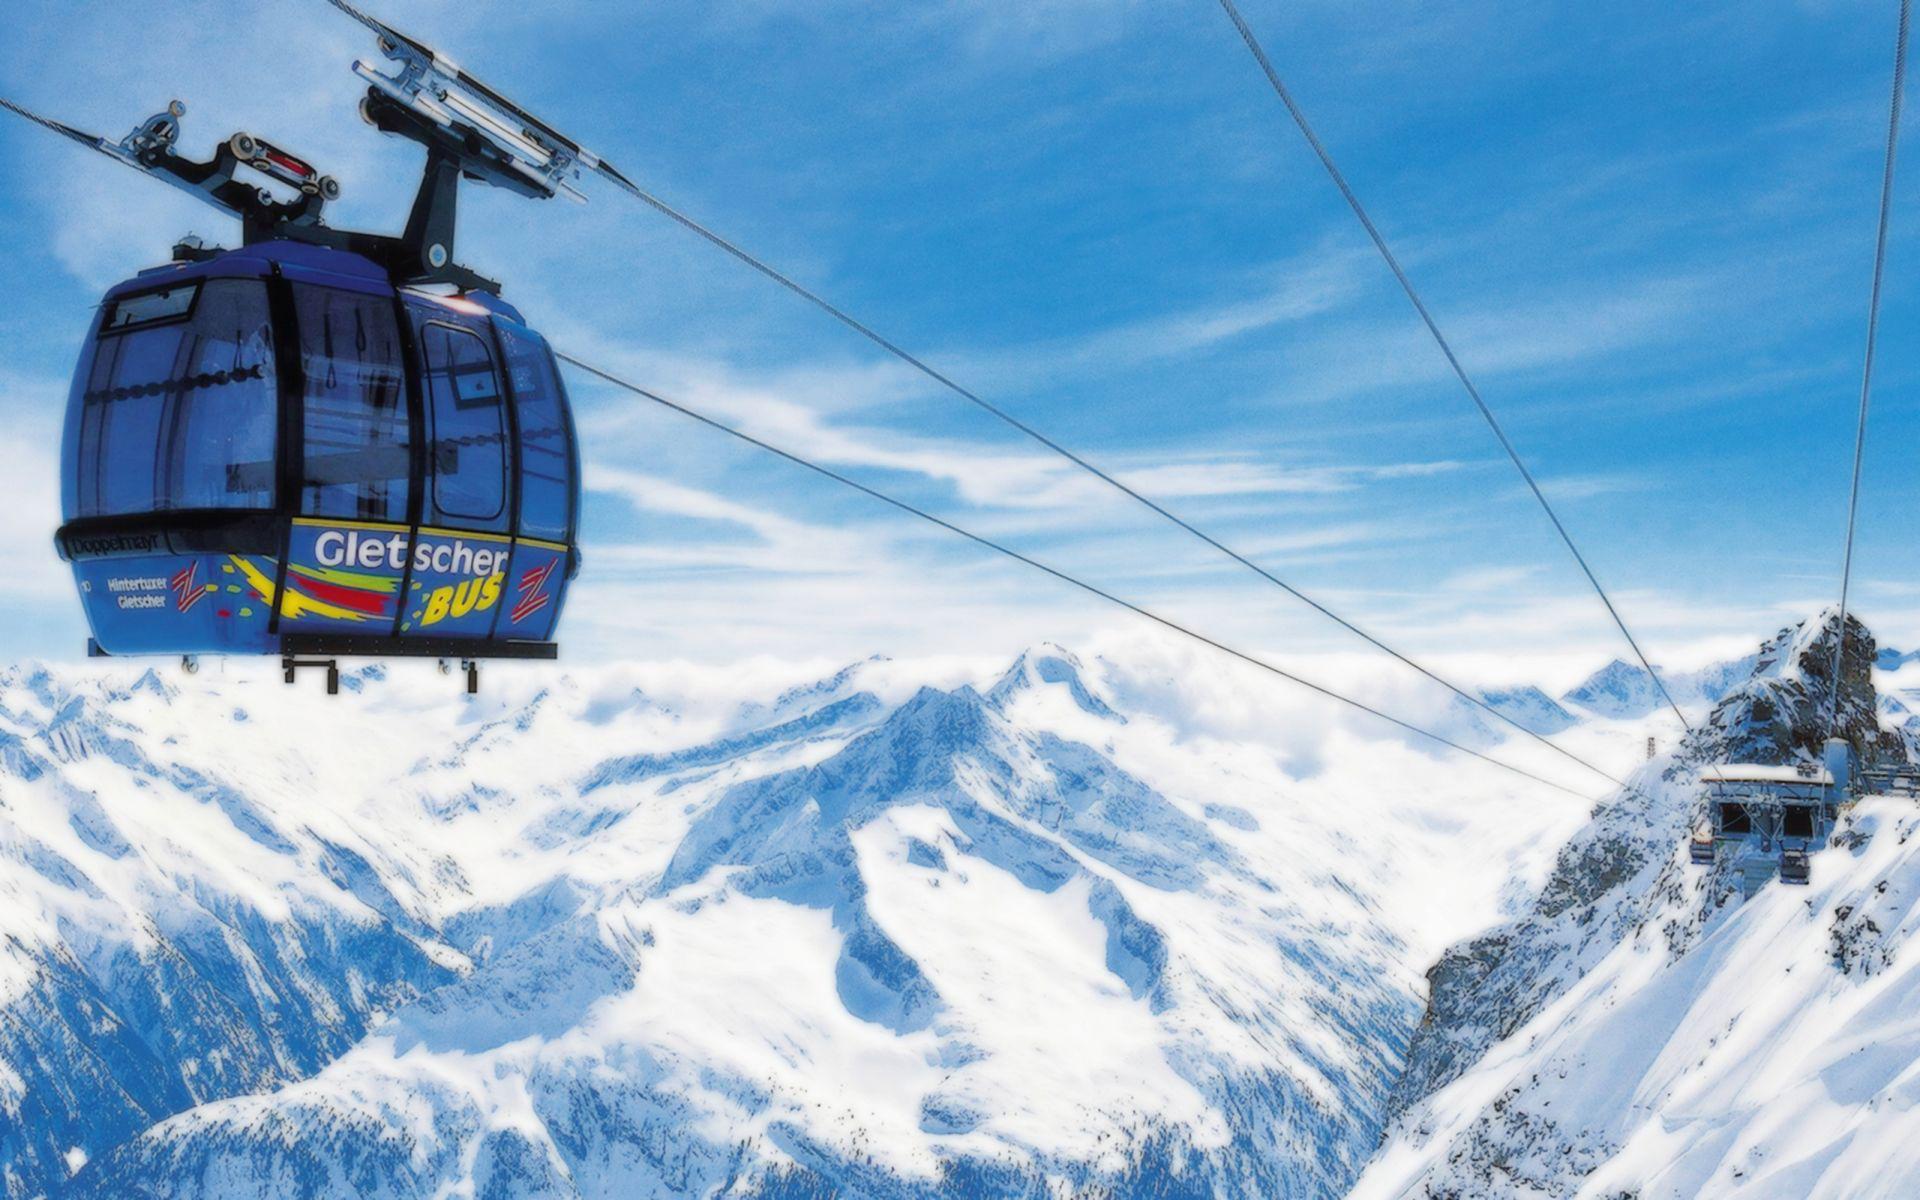 Cable car in a ski resort wallpaper 8975 1920x1200